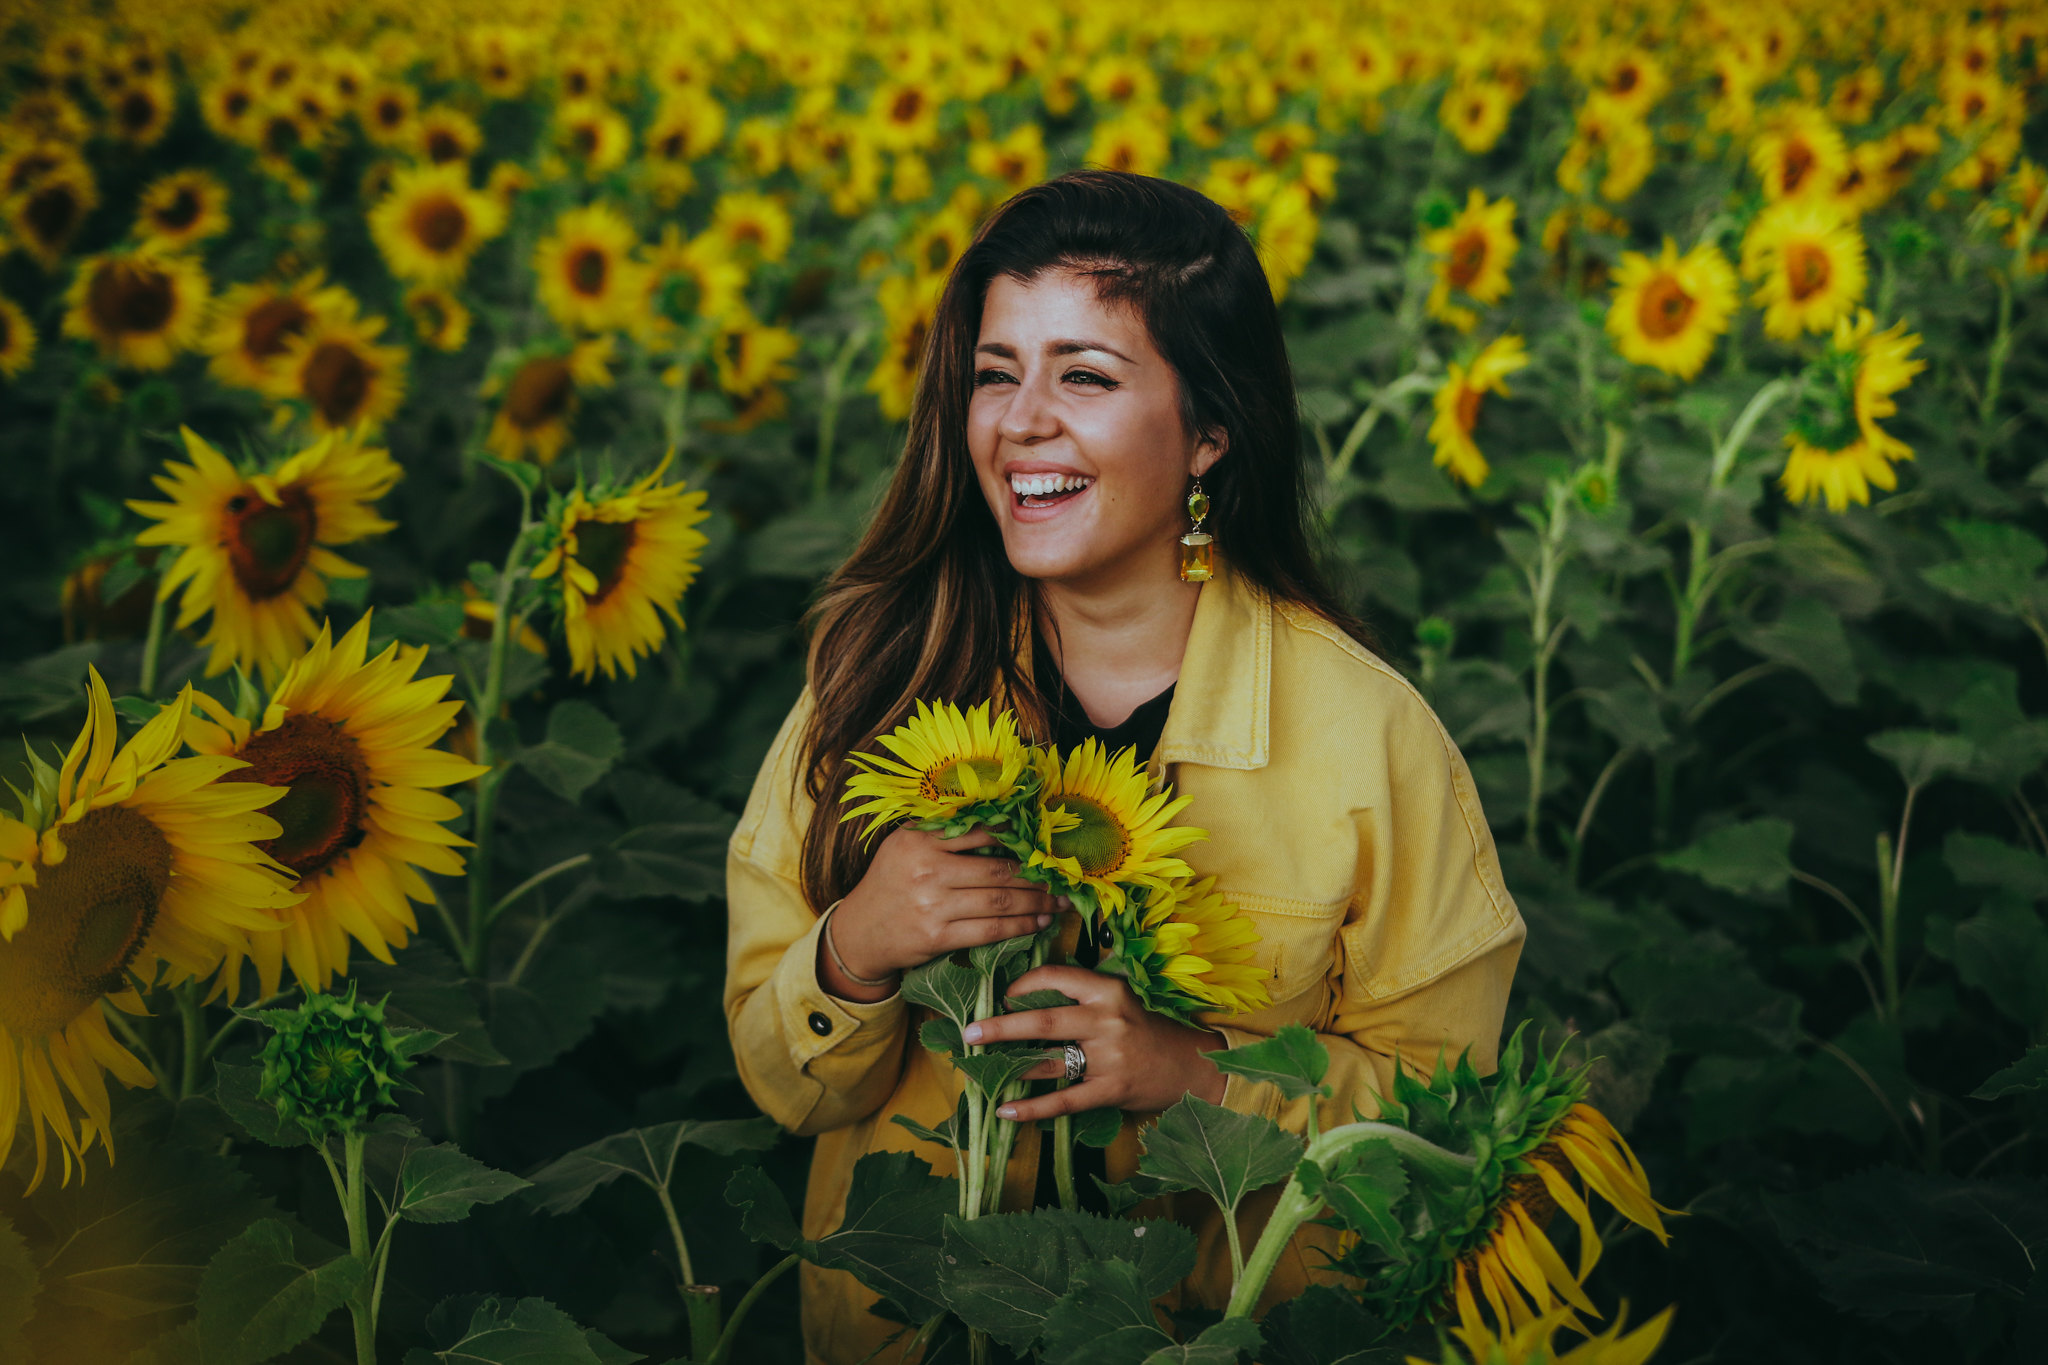 auringonkukkia-16